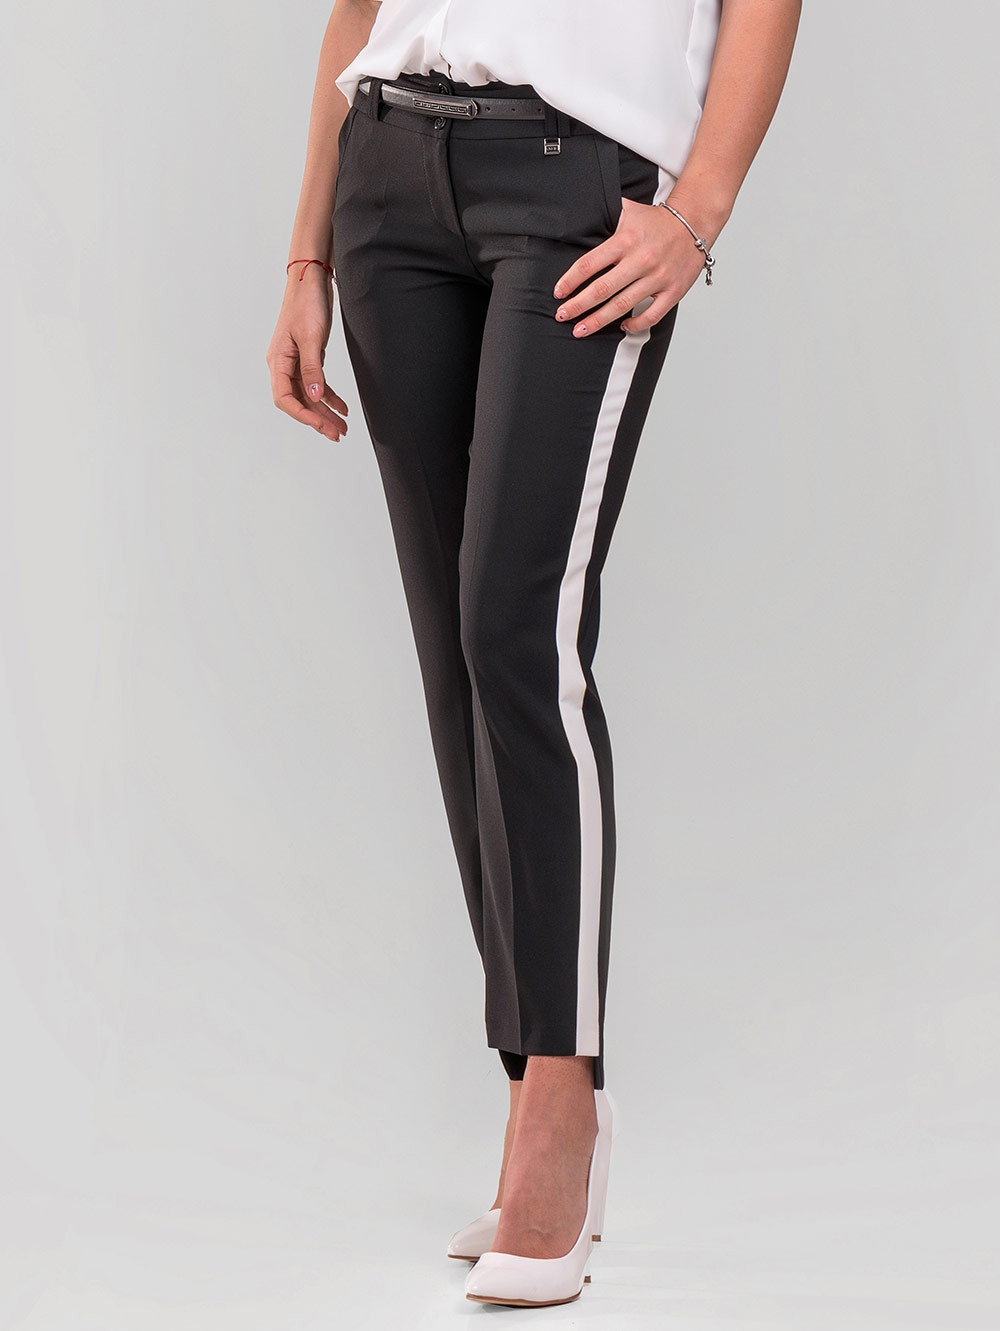 b52e0a08bef Черен елегантен дамски панталон с кант - големи размери | Дамски Панталони  от INDIGO Fashion